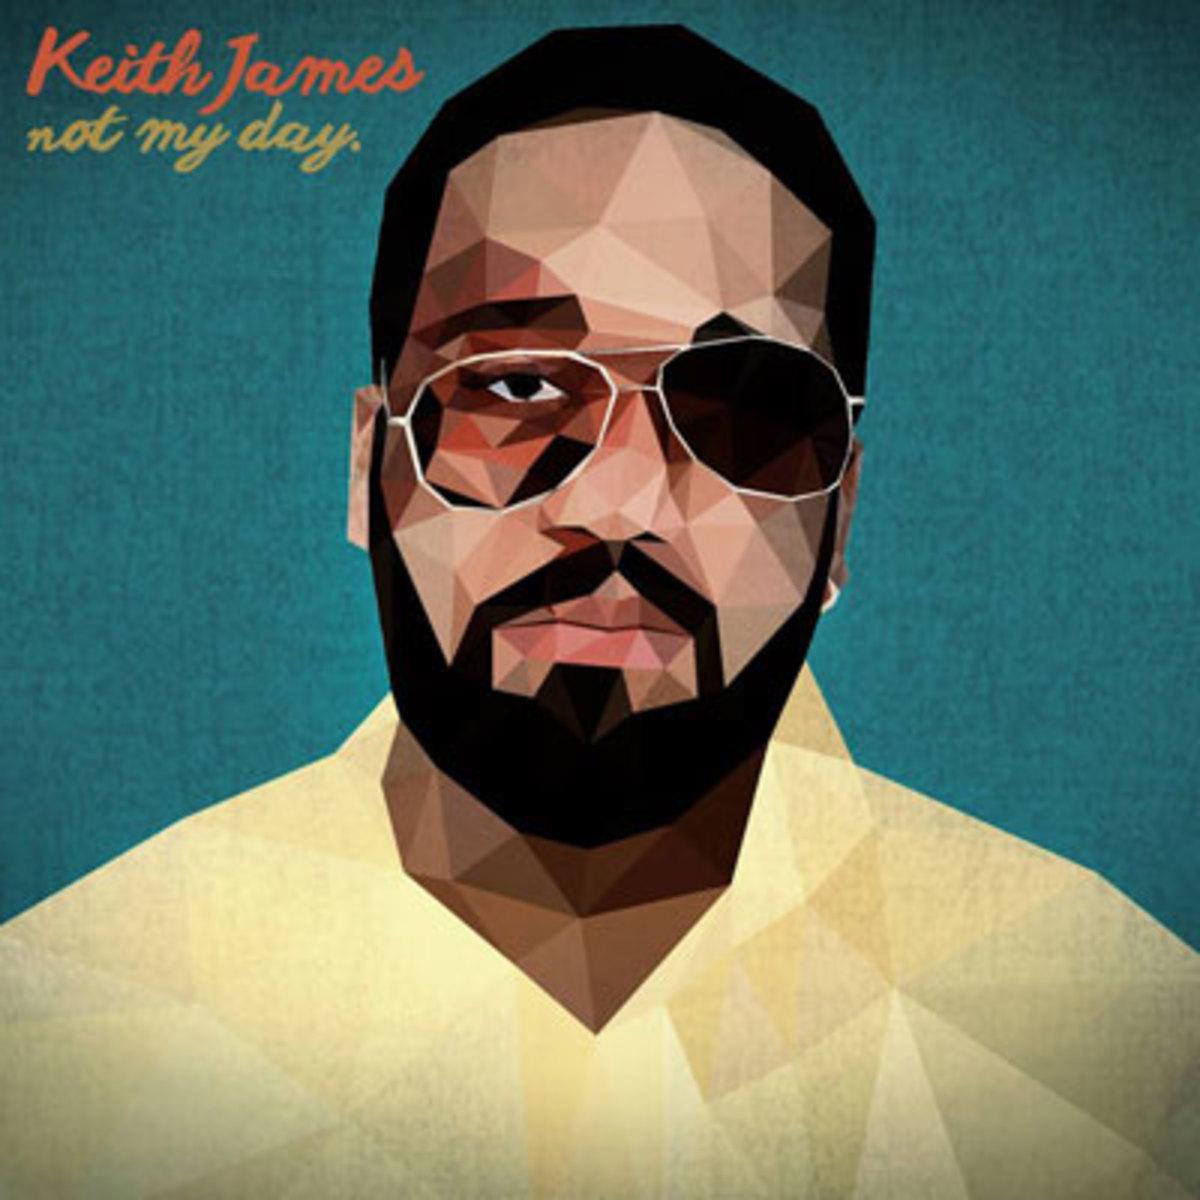 keithjames-notmyday.jpg